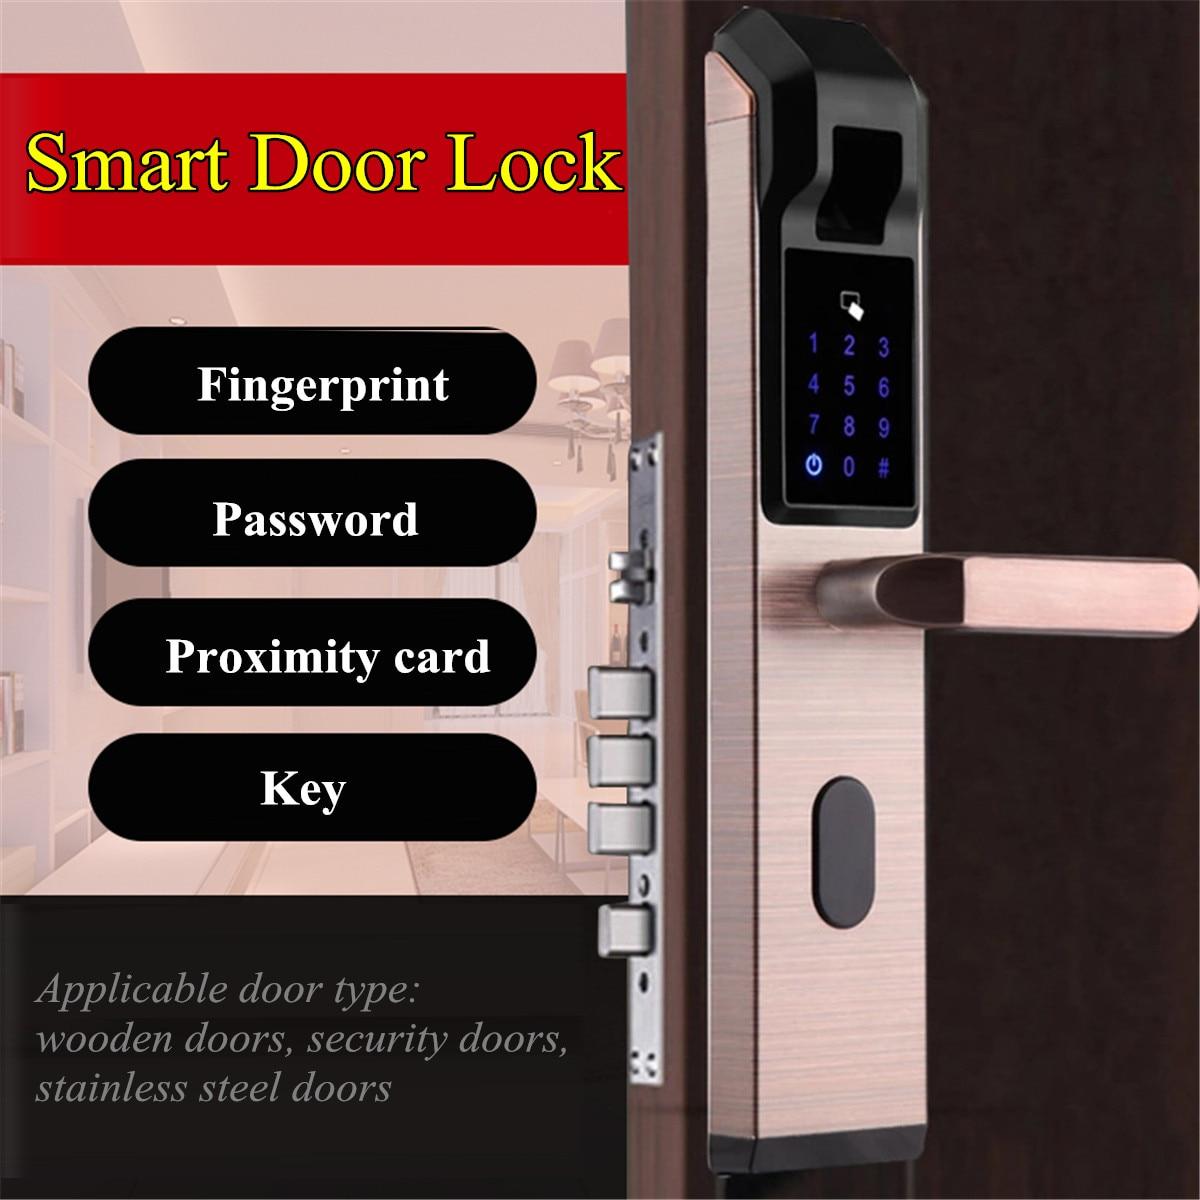 Security Smart Electronic Door Lock Fingerprint Password Access Anti-theft Lock Access Control System Set House Apartment 4 Ways